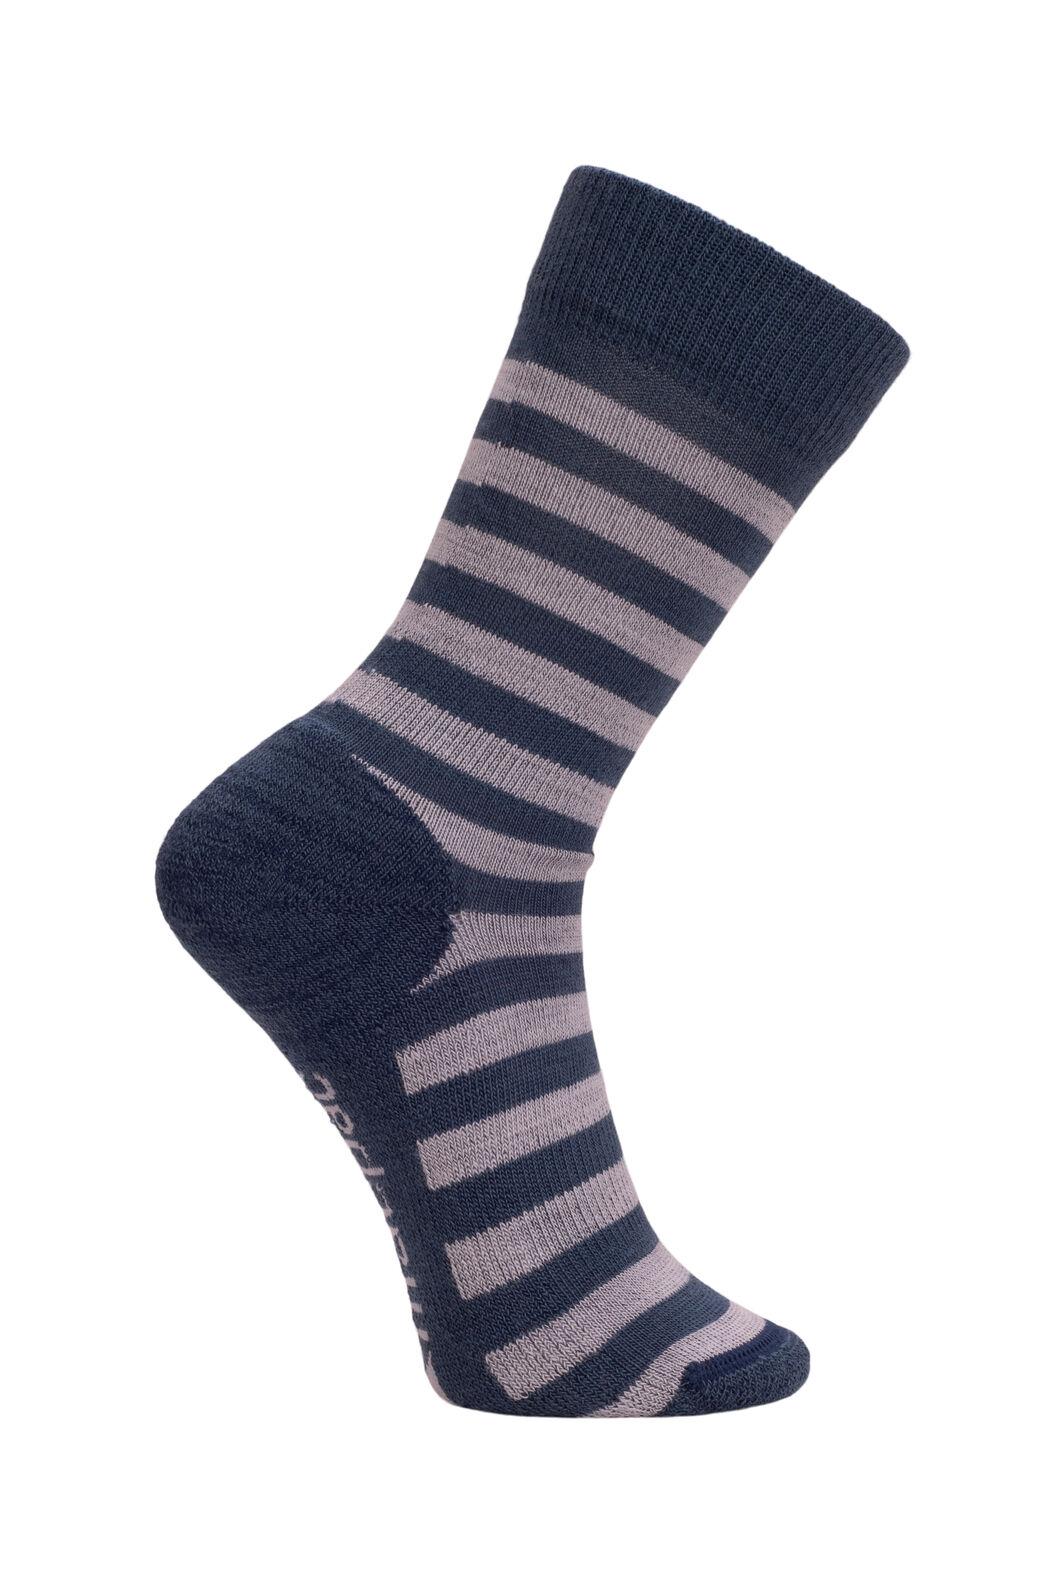 Macpac Kids' Footprint Sock, Ensign/High Rise Stripe, hi-res